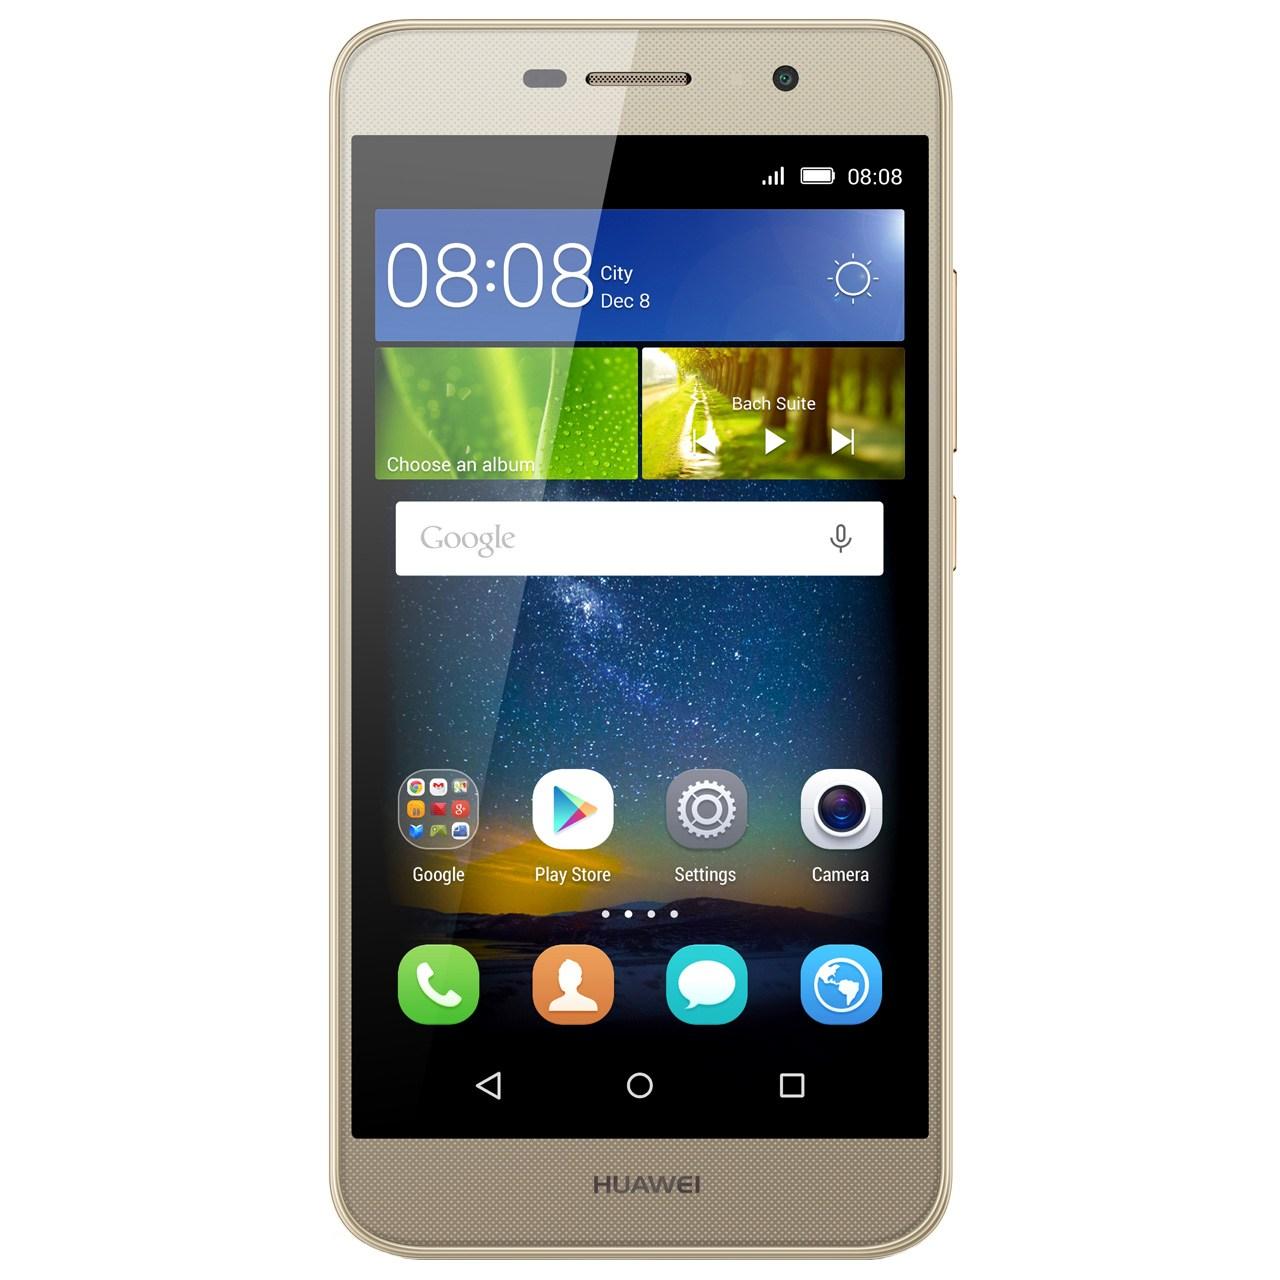 گوشی موبایل هوآوی مدل Y6 Pro TIT-U02 دو سیم کارت | Huawei Y6 Pro TIT-U02 Dual SIM Mobile Phone